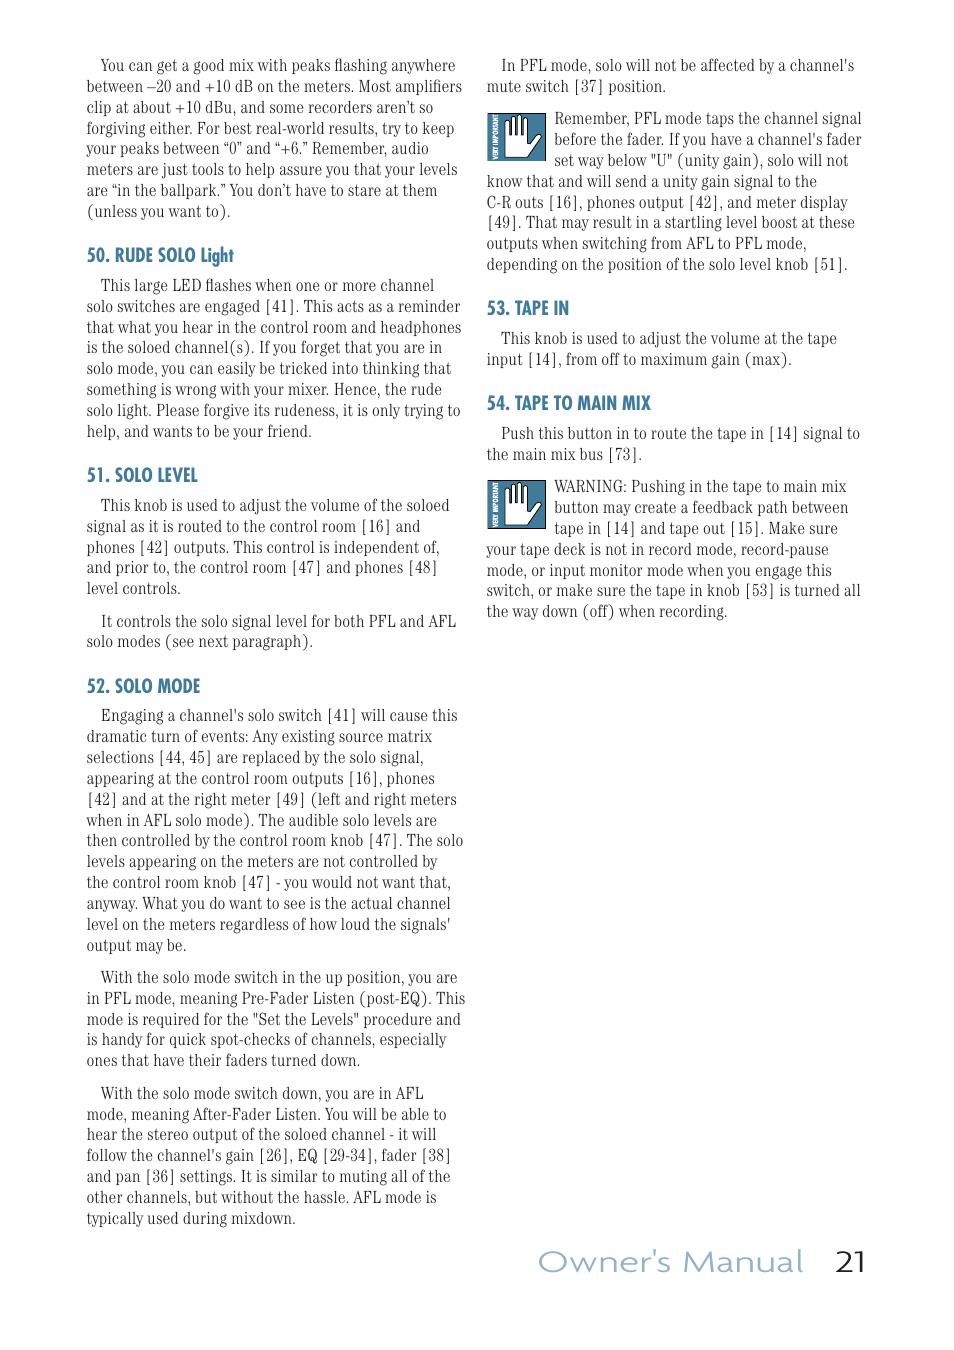 rude solo light solo level solo mode mackie onyx 1640i user rh manualsdir com User Manual User Manual PDF